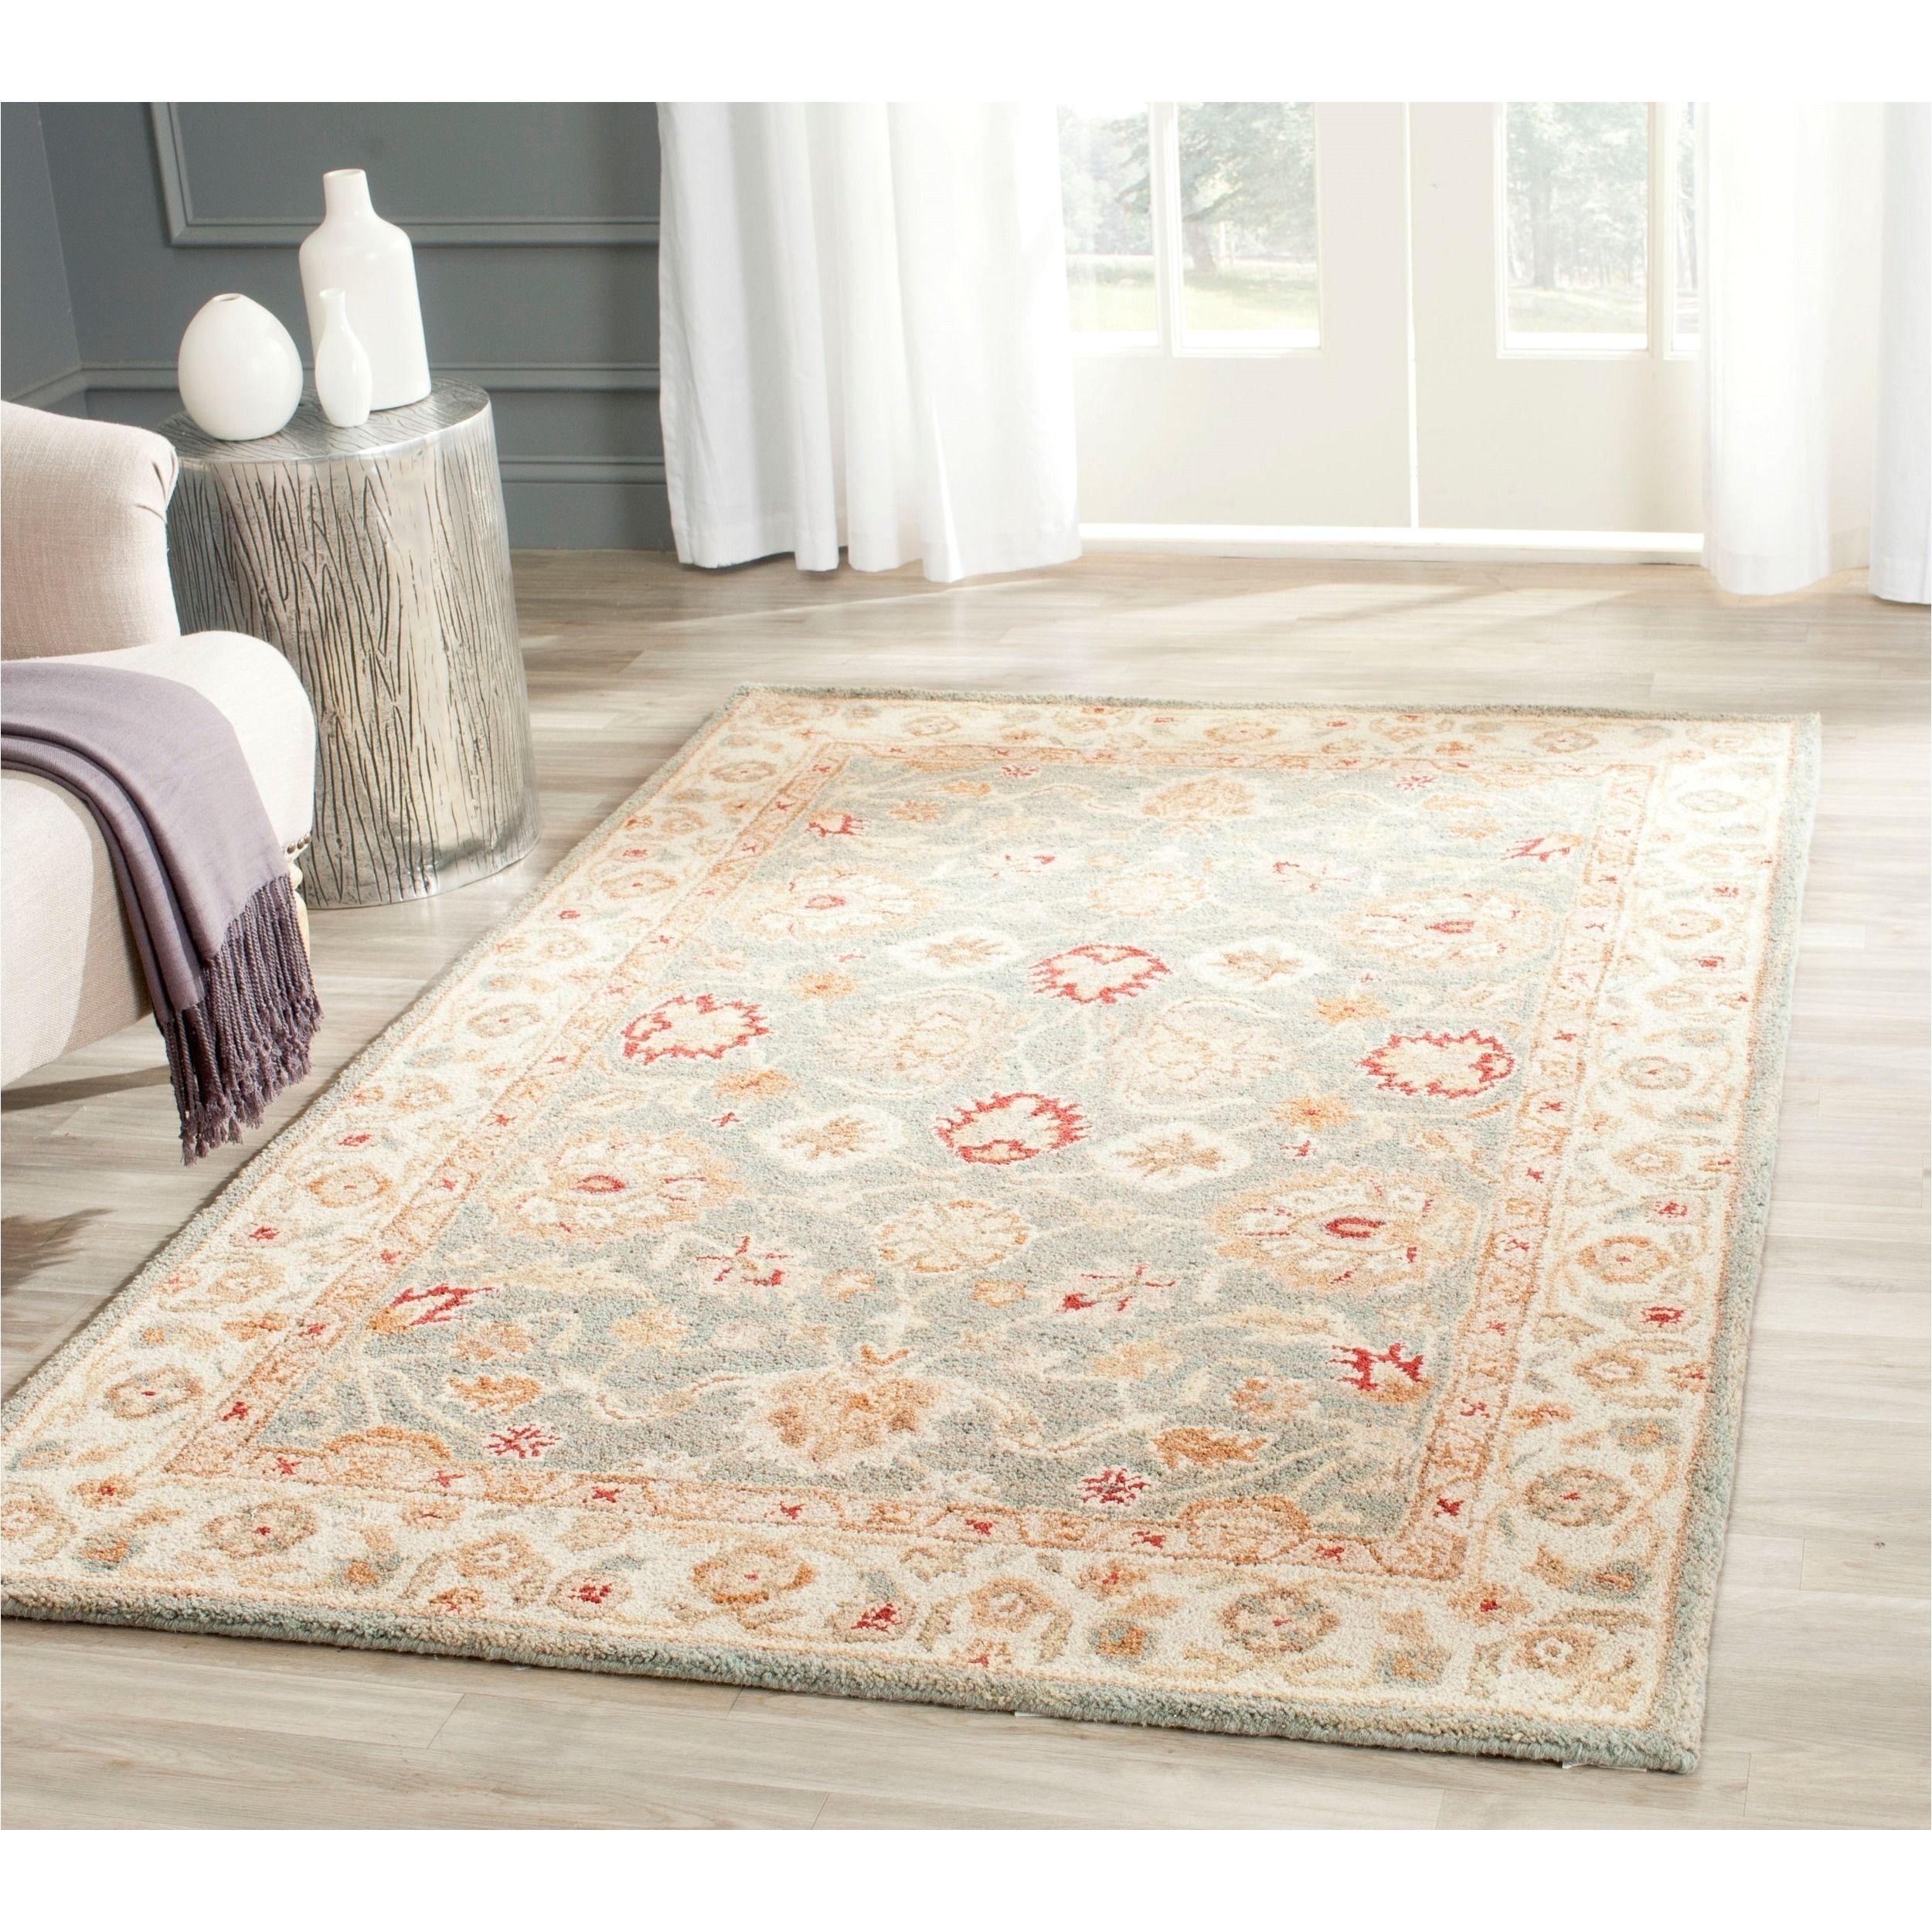 safavieh handmade antiquity grey beige wool rug 4 x 6 at822a 4 size 4 x 6